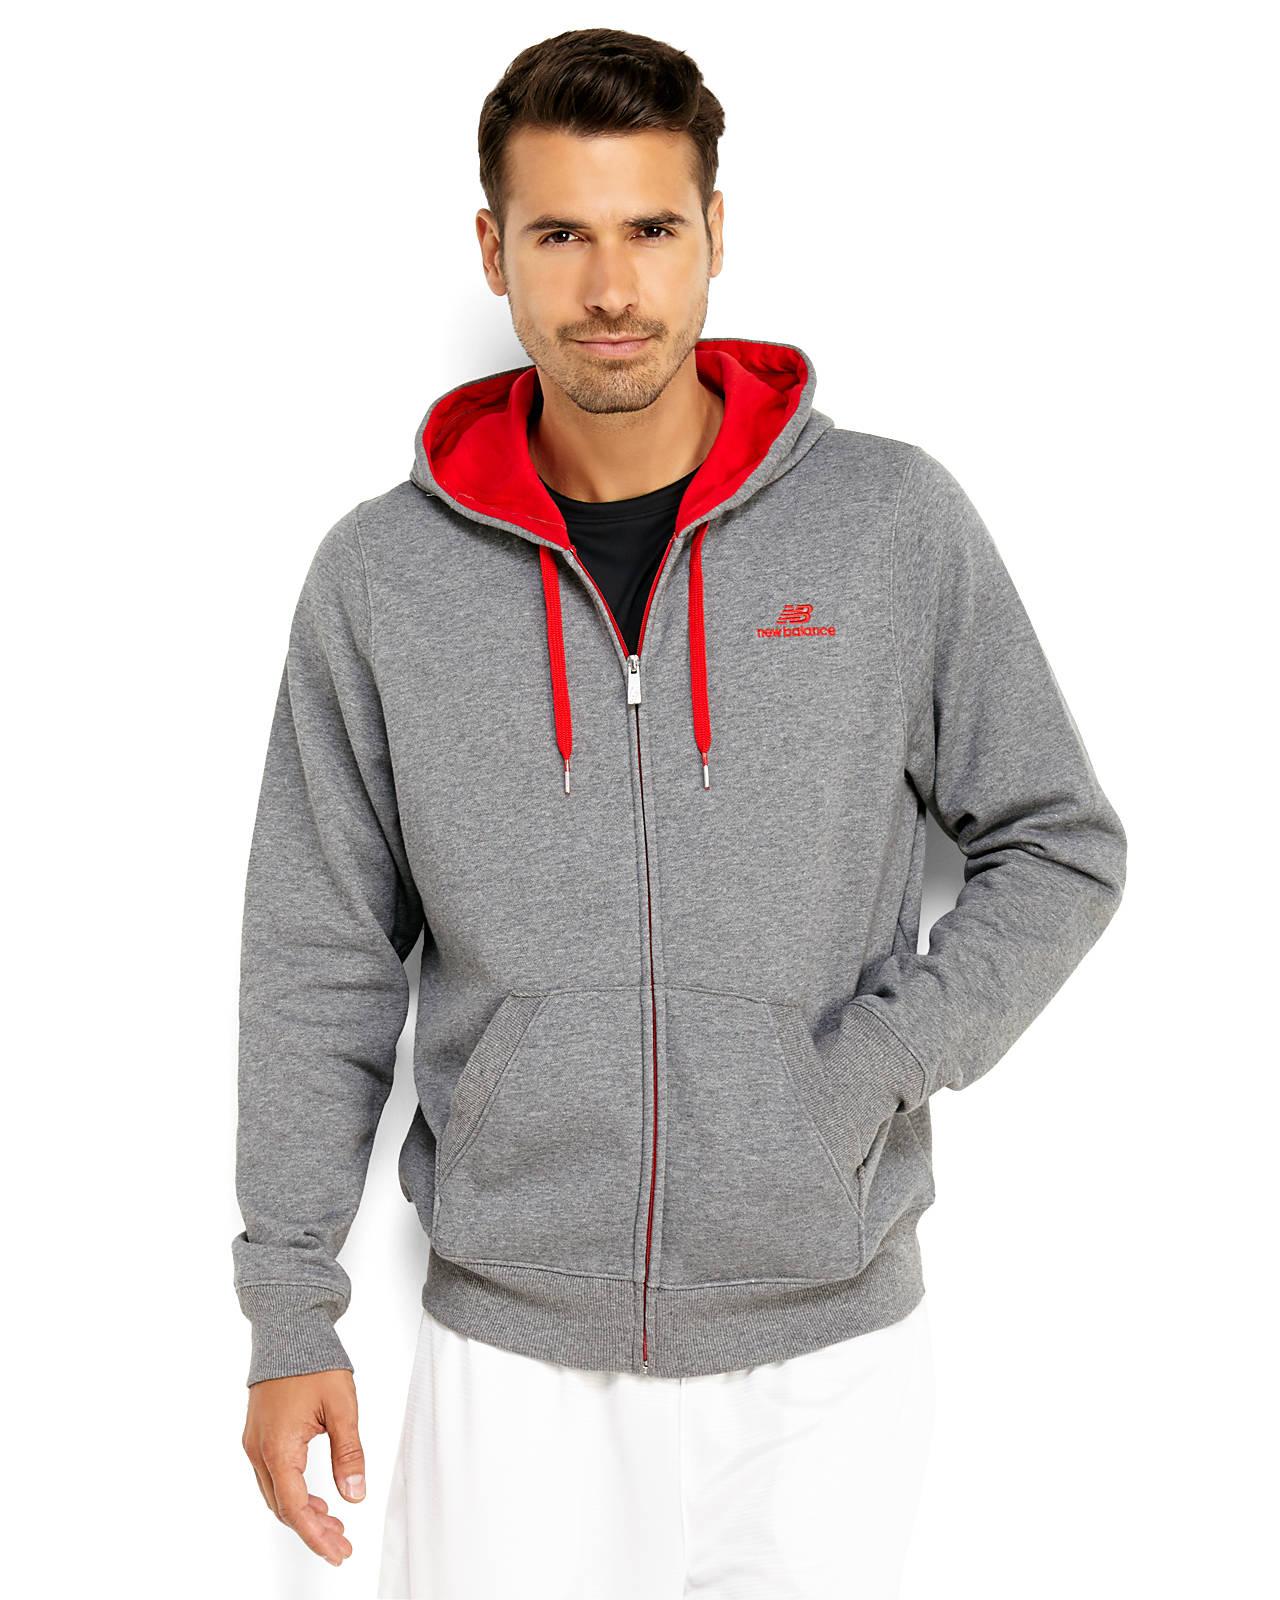 lyst new balance full zip hoodie in gray for men. Black Bedroom Furniture Sets. Home Design Ideas